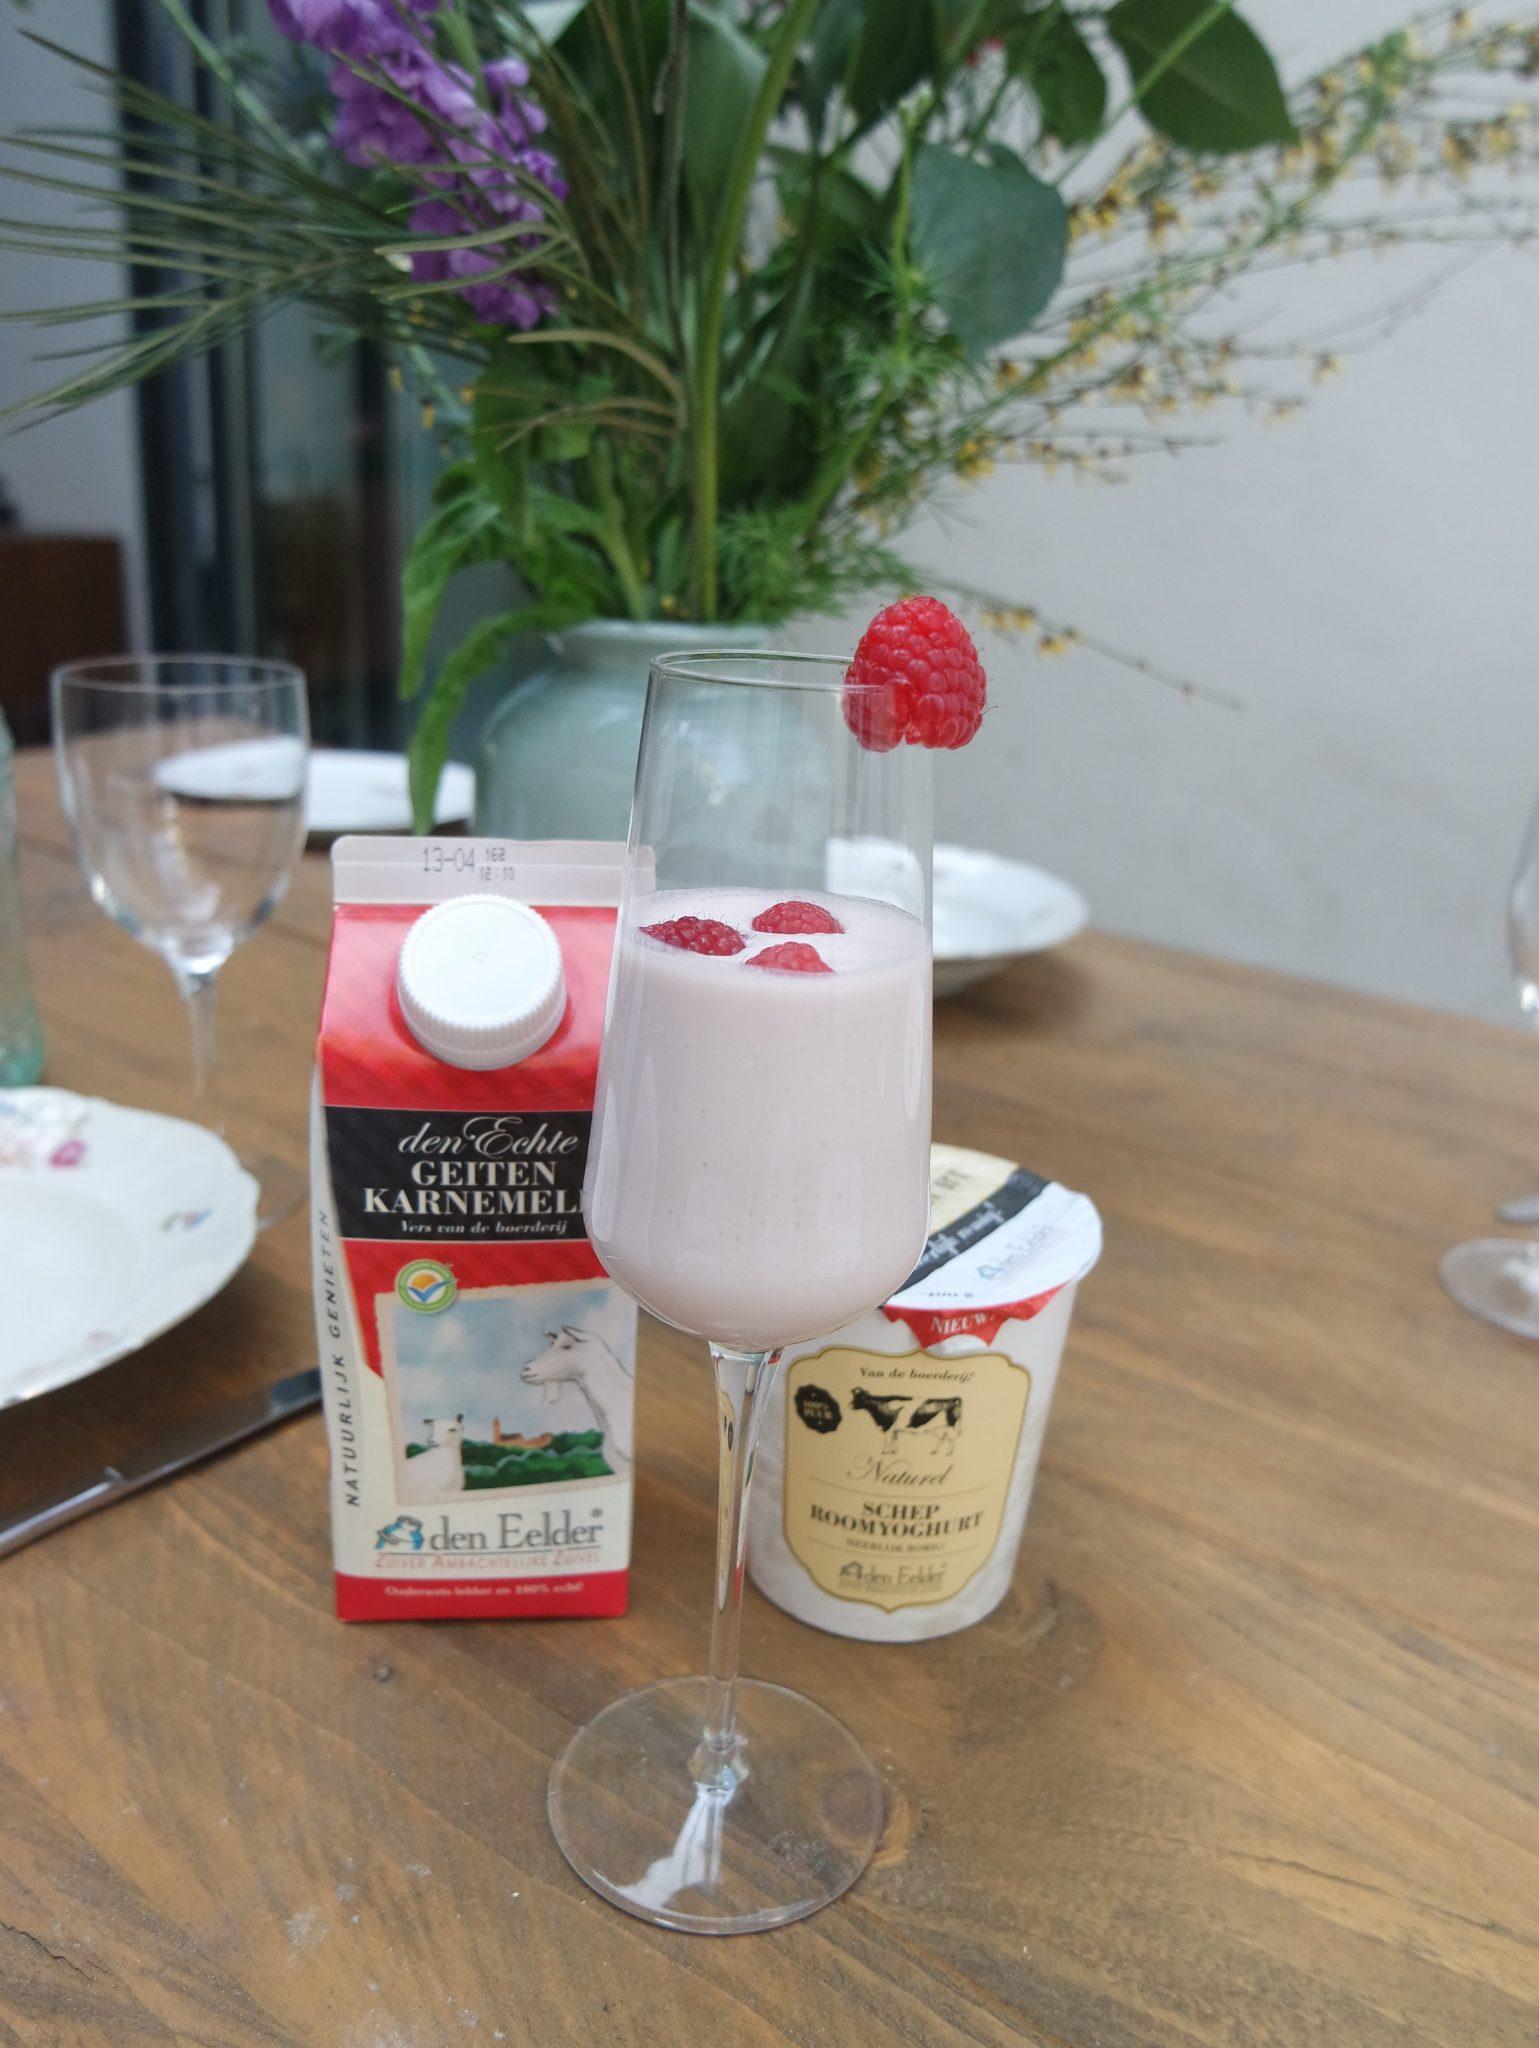 scroppino karnemelk yoghurt den eelder